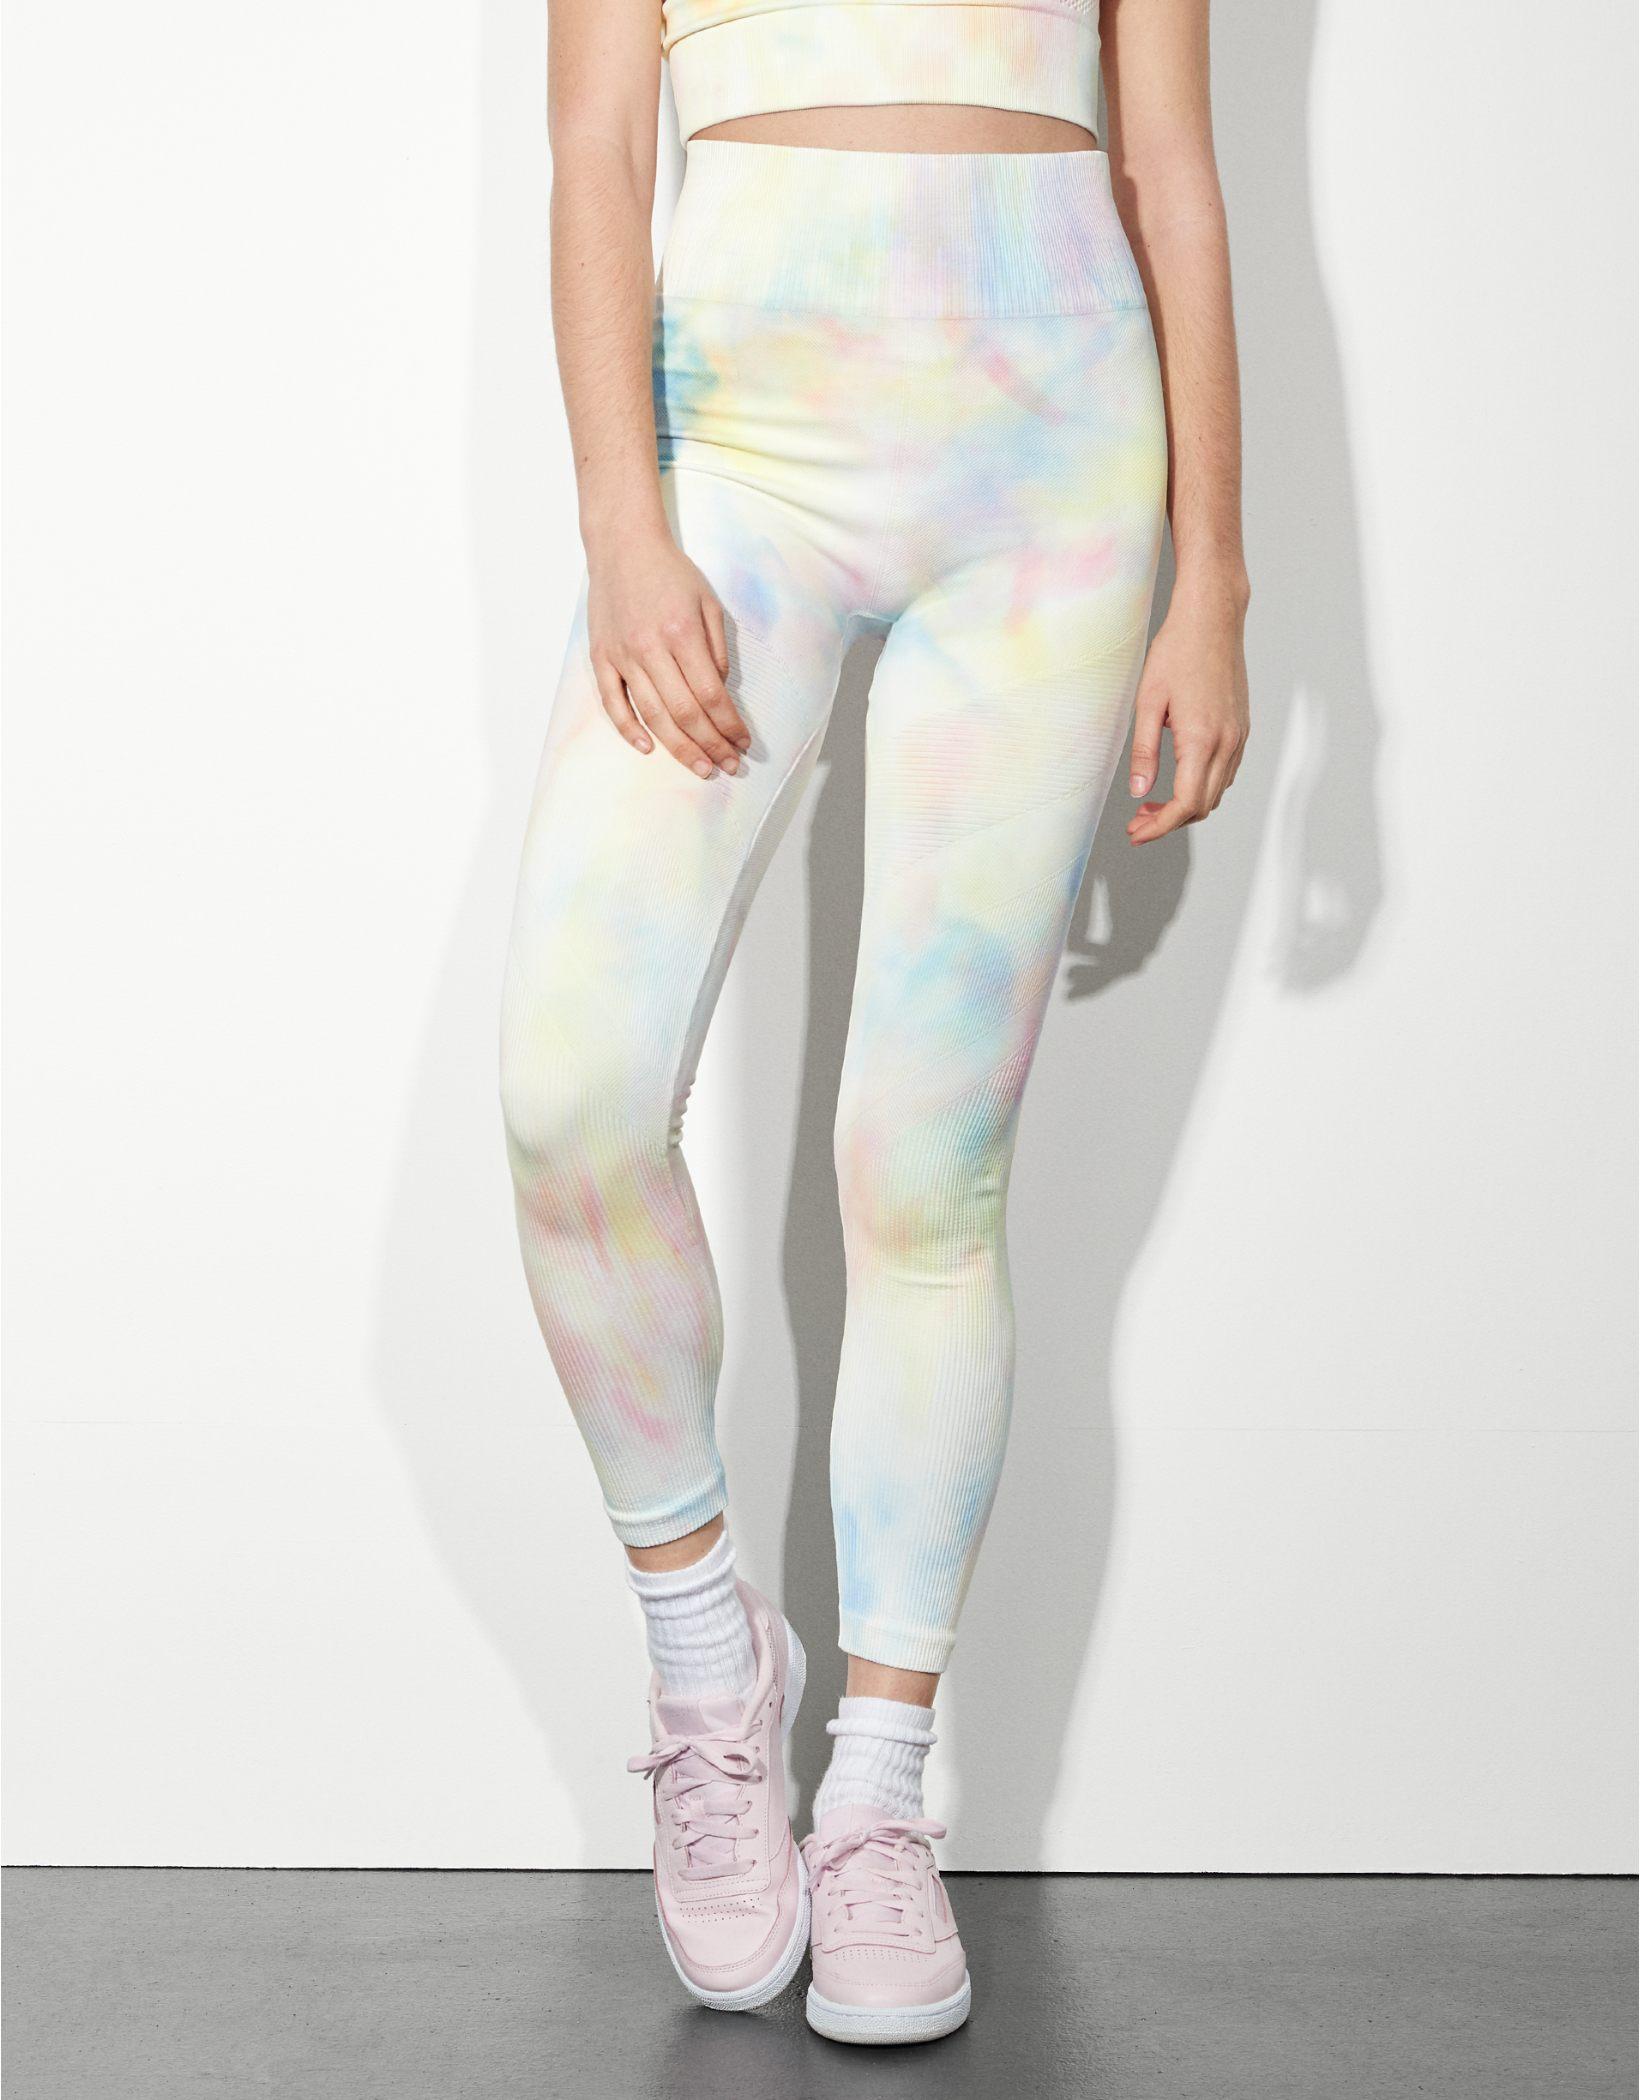 TACKMA Tech Tie-Dye Seamless Legging